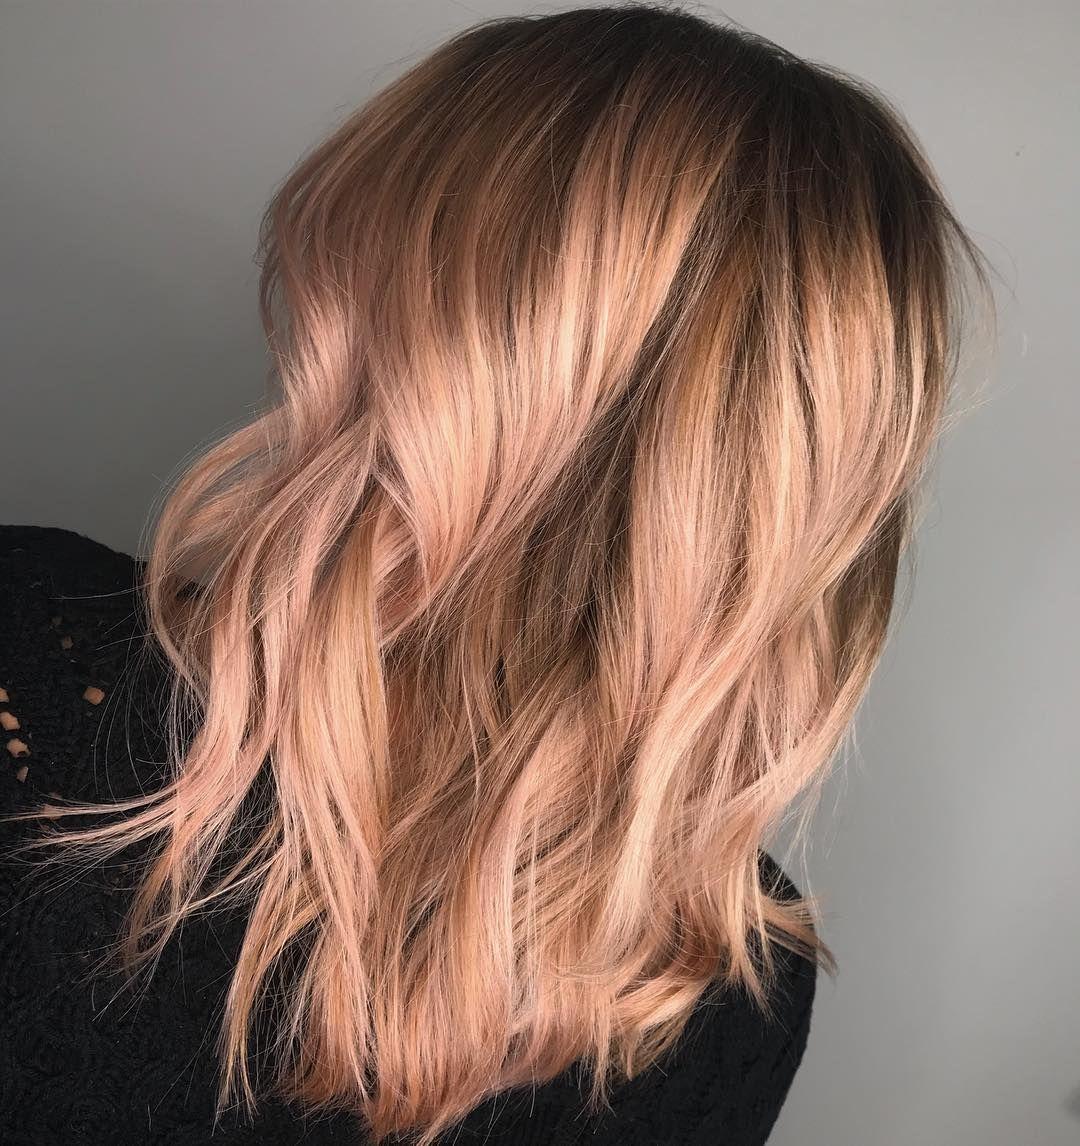 Rose Gold Hair Blonde Hair Blue Eyes Makeup Caring For Colored Hair Gold Hair